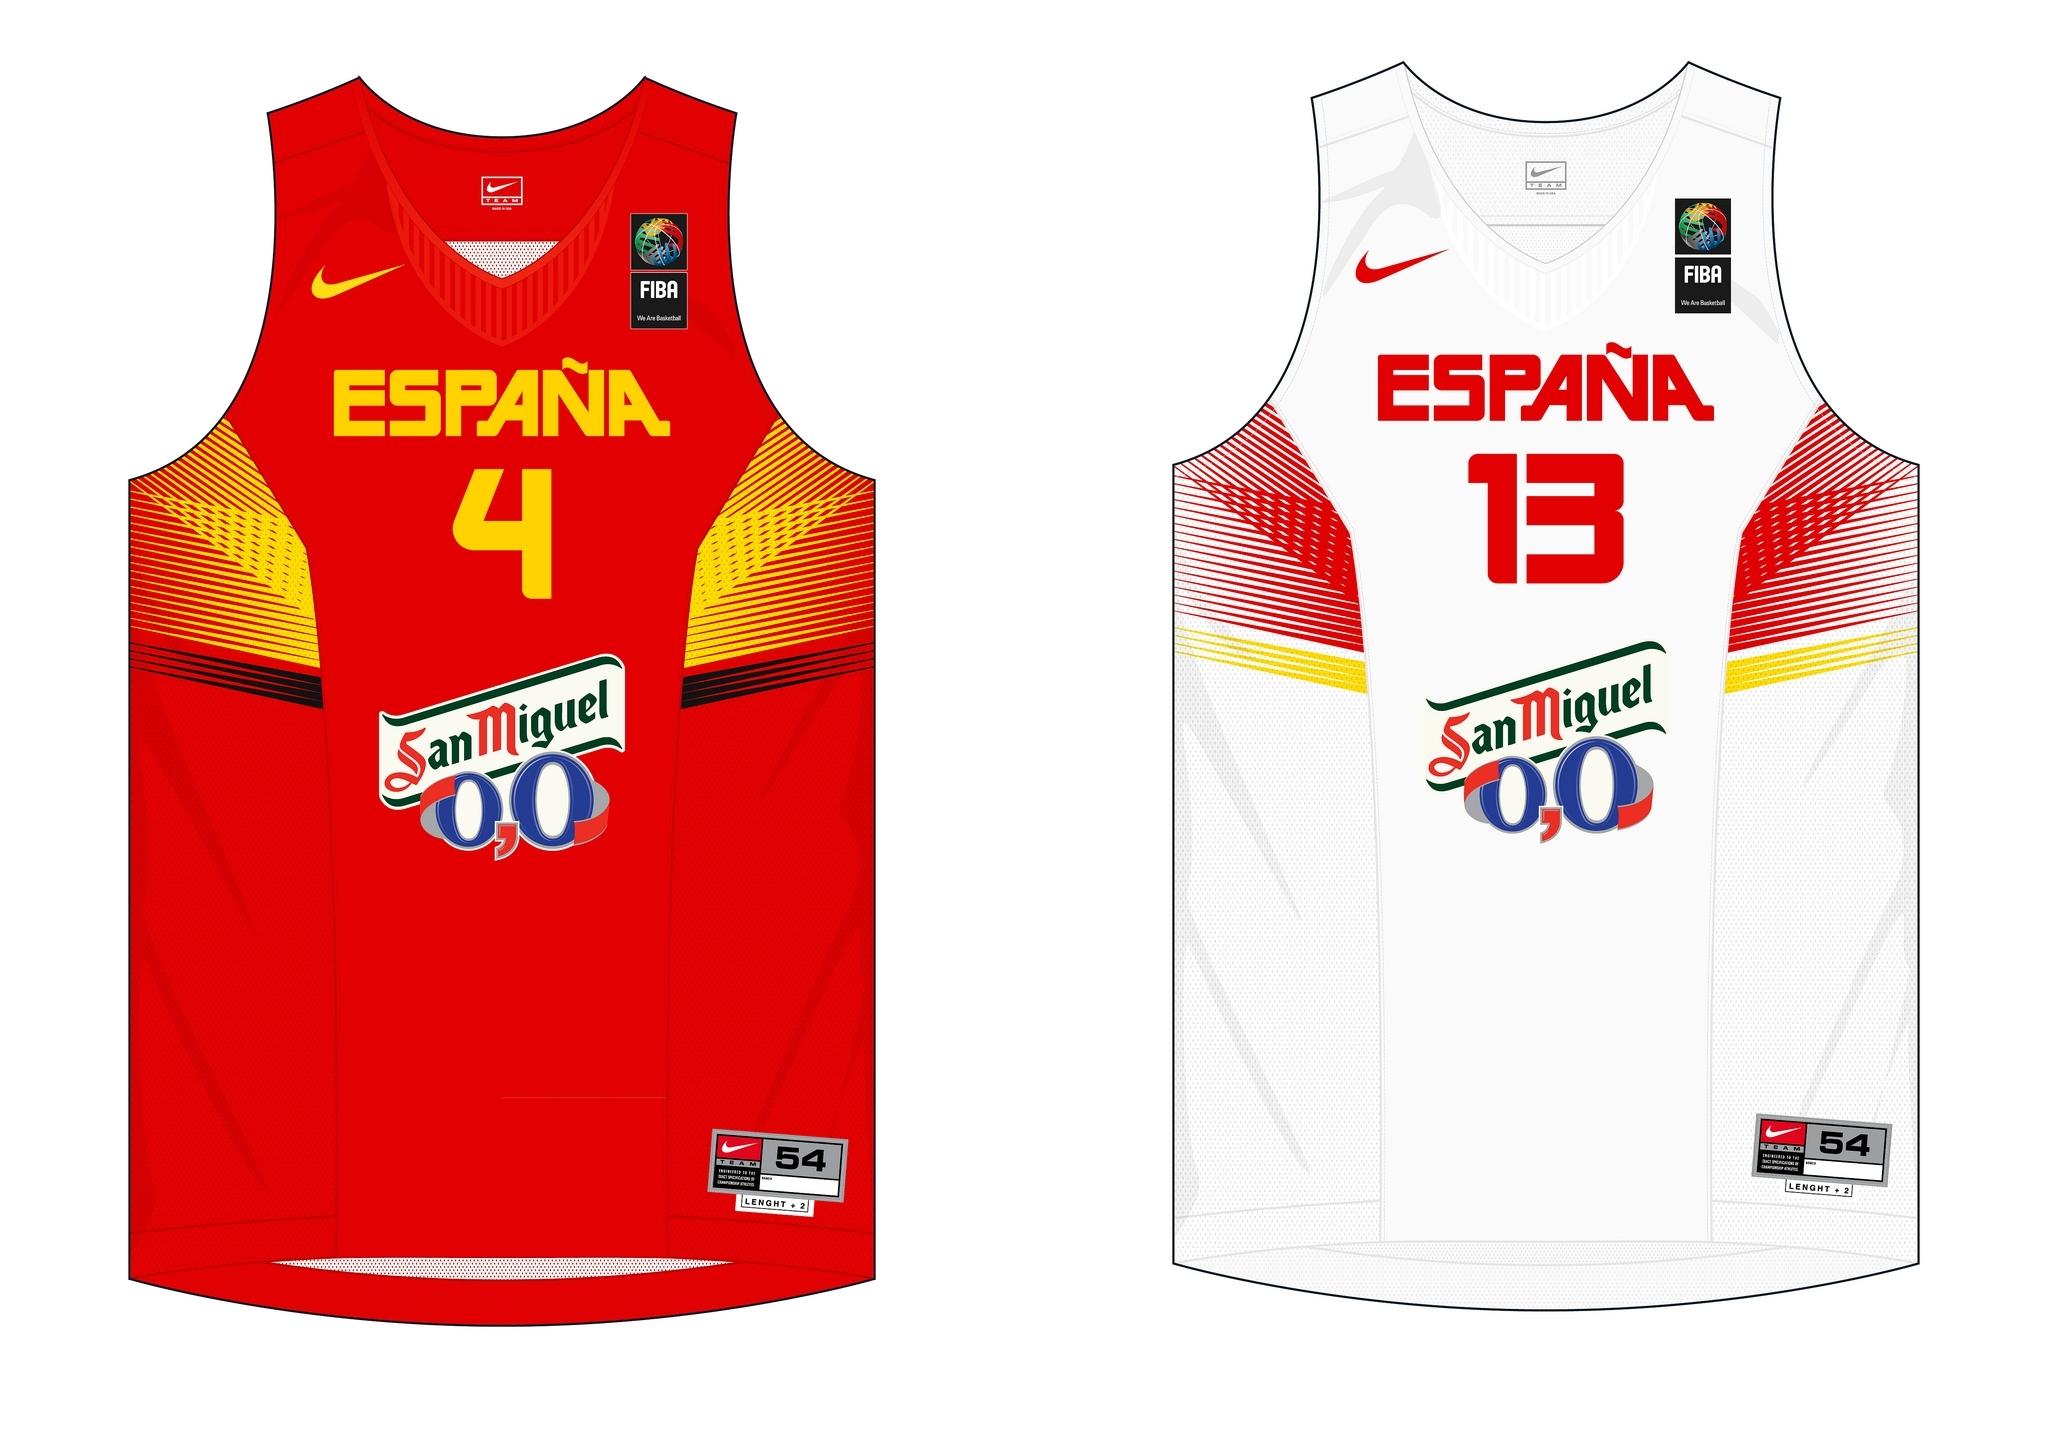 spain national team jersey (fiba world championship 2014, spain) | nba